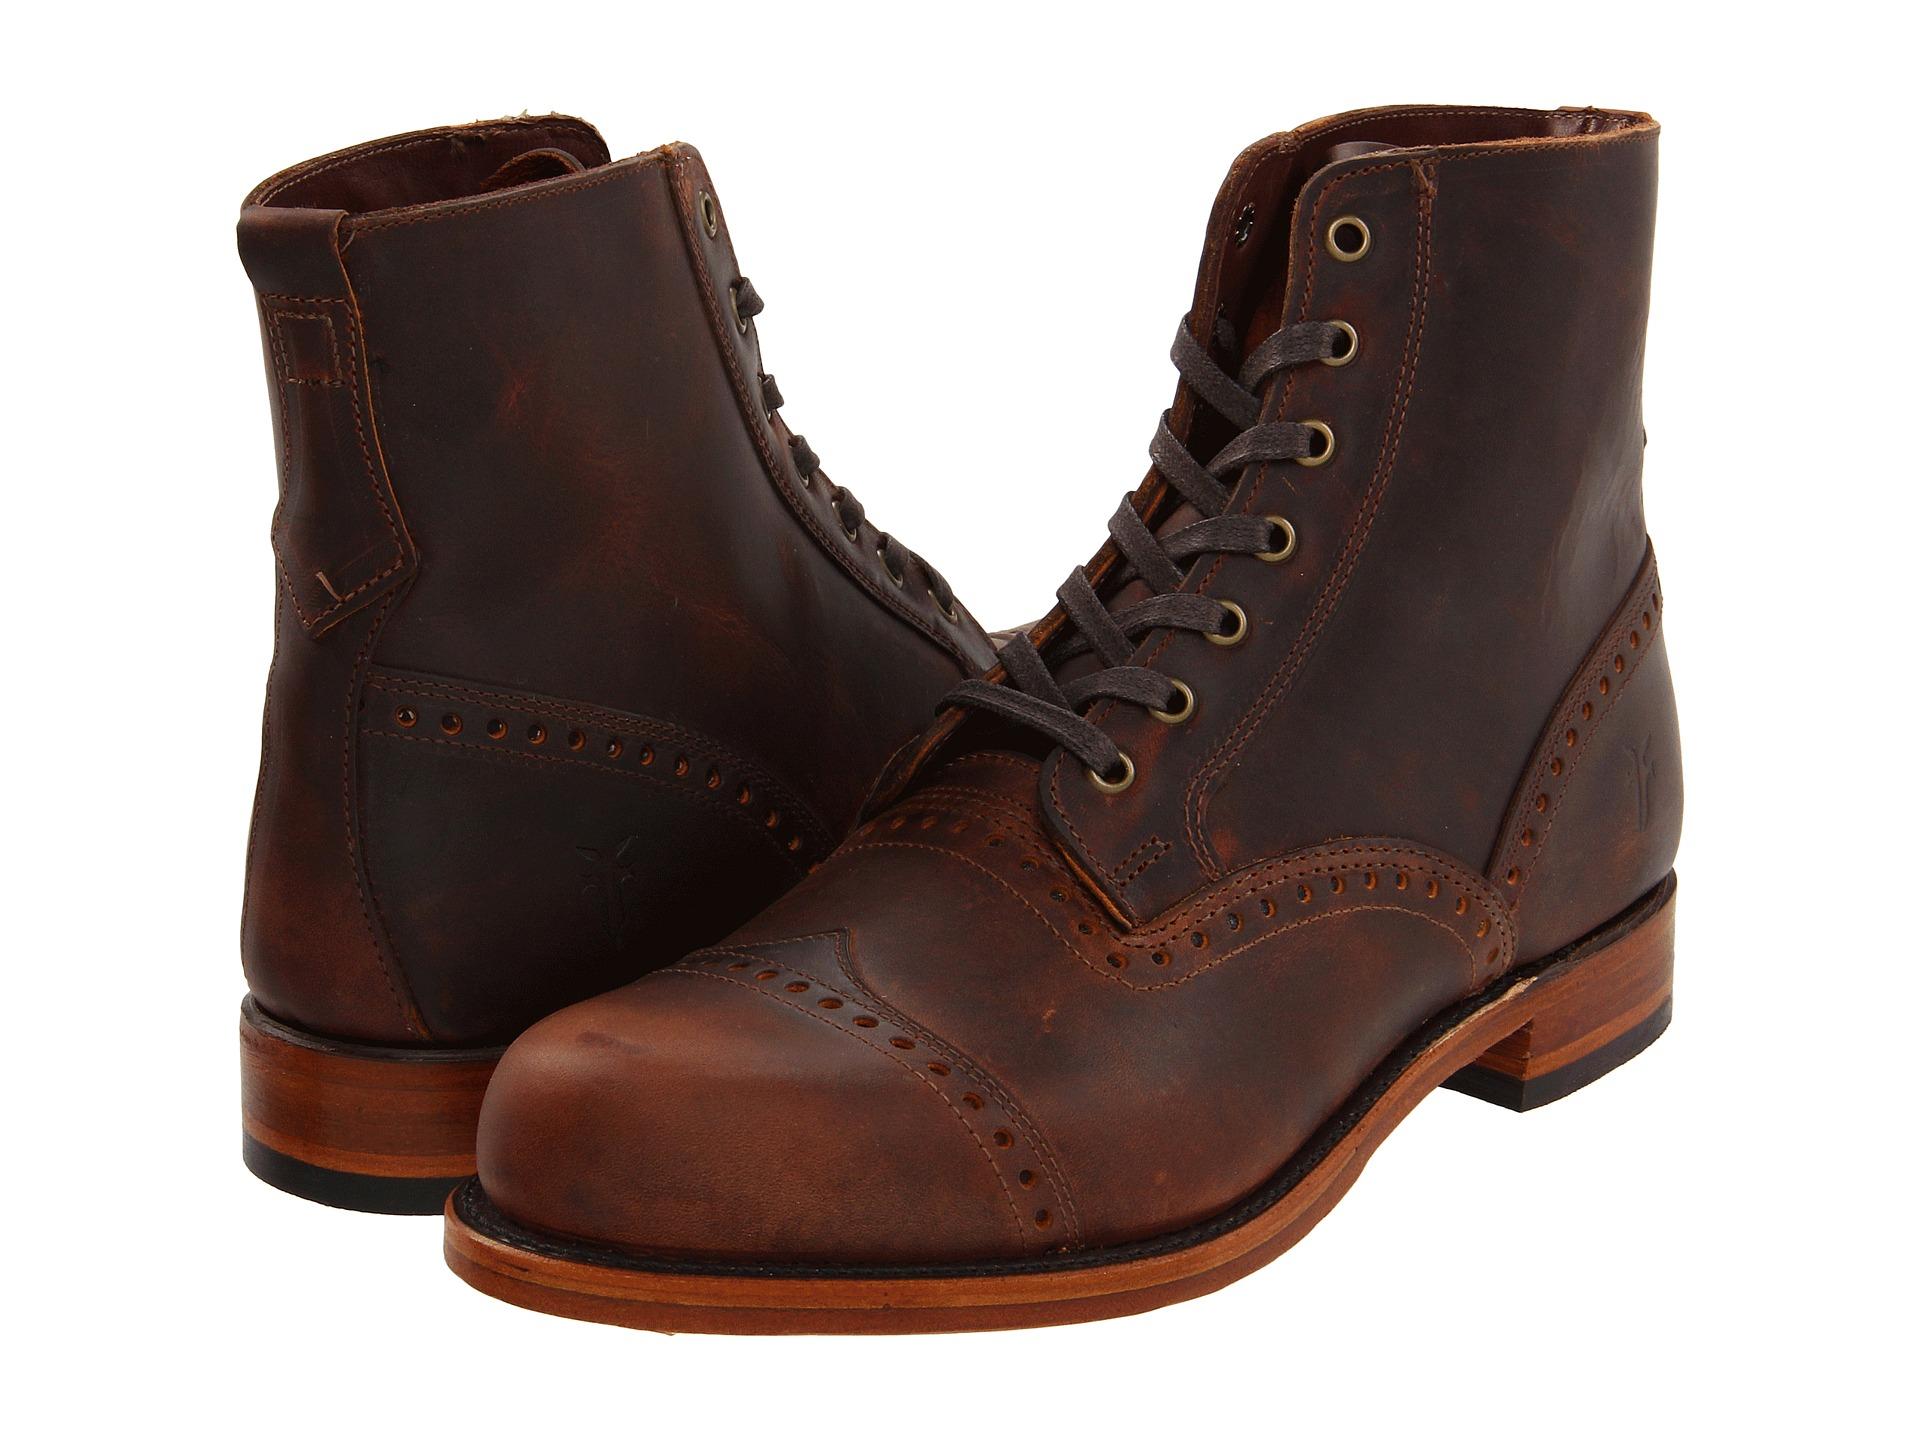 grandco sandals zappos frye boots